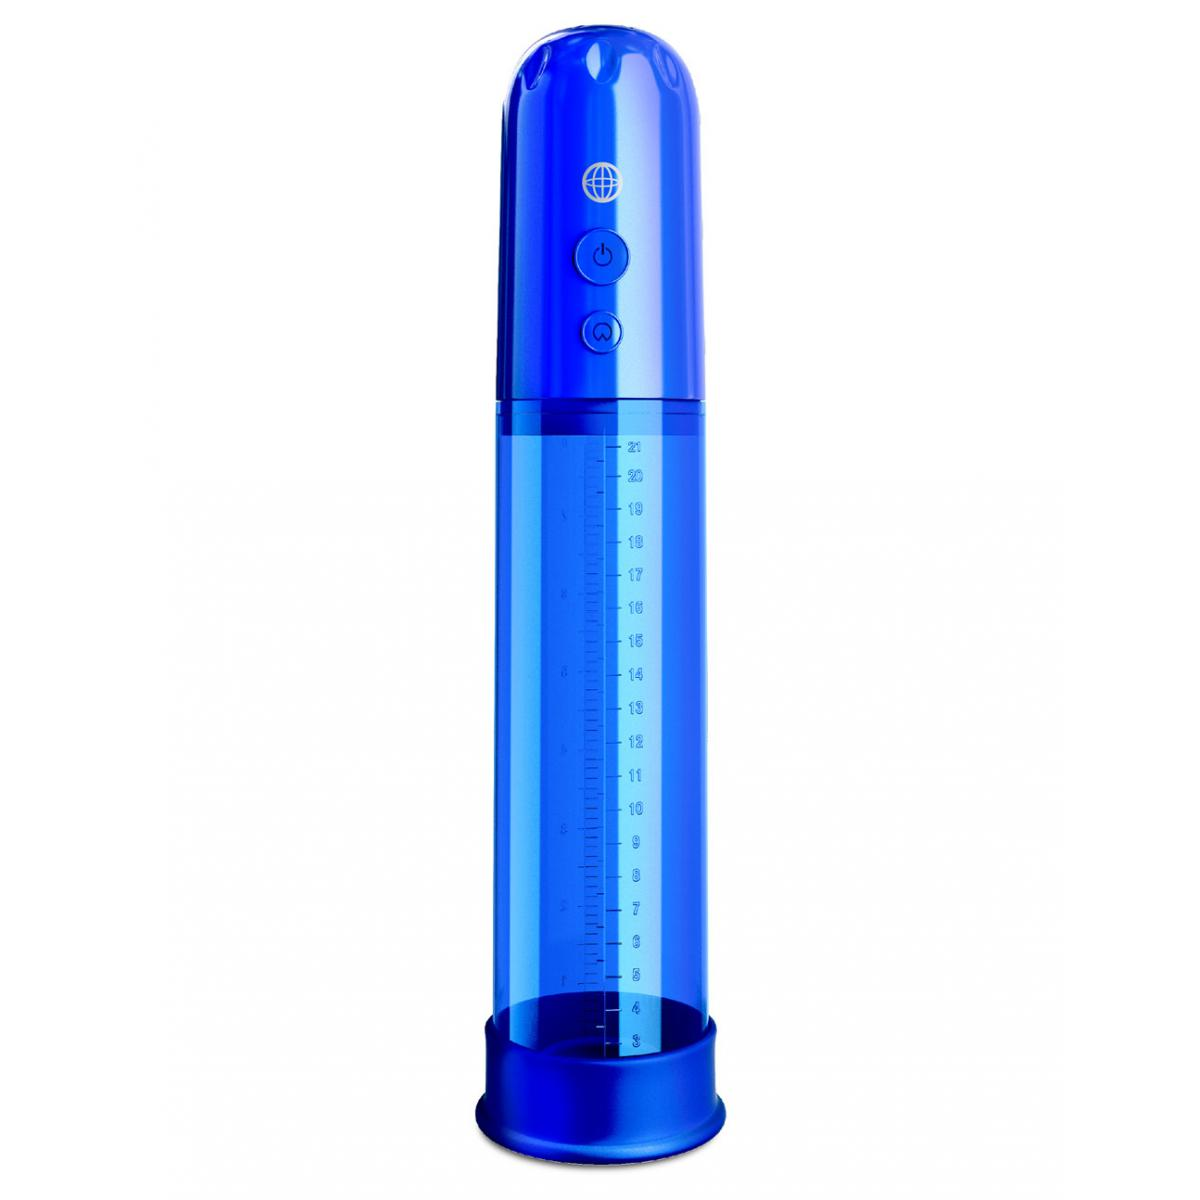 Classix Auto-Vac Power Pump - Blue